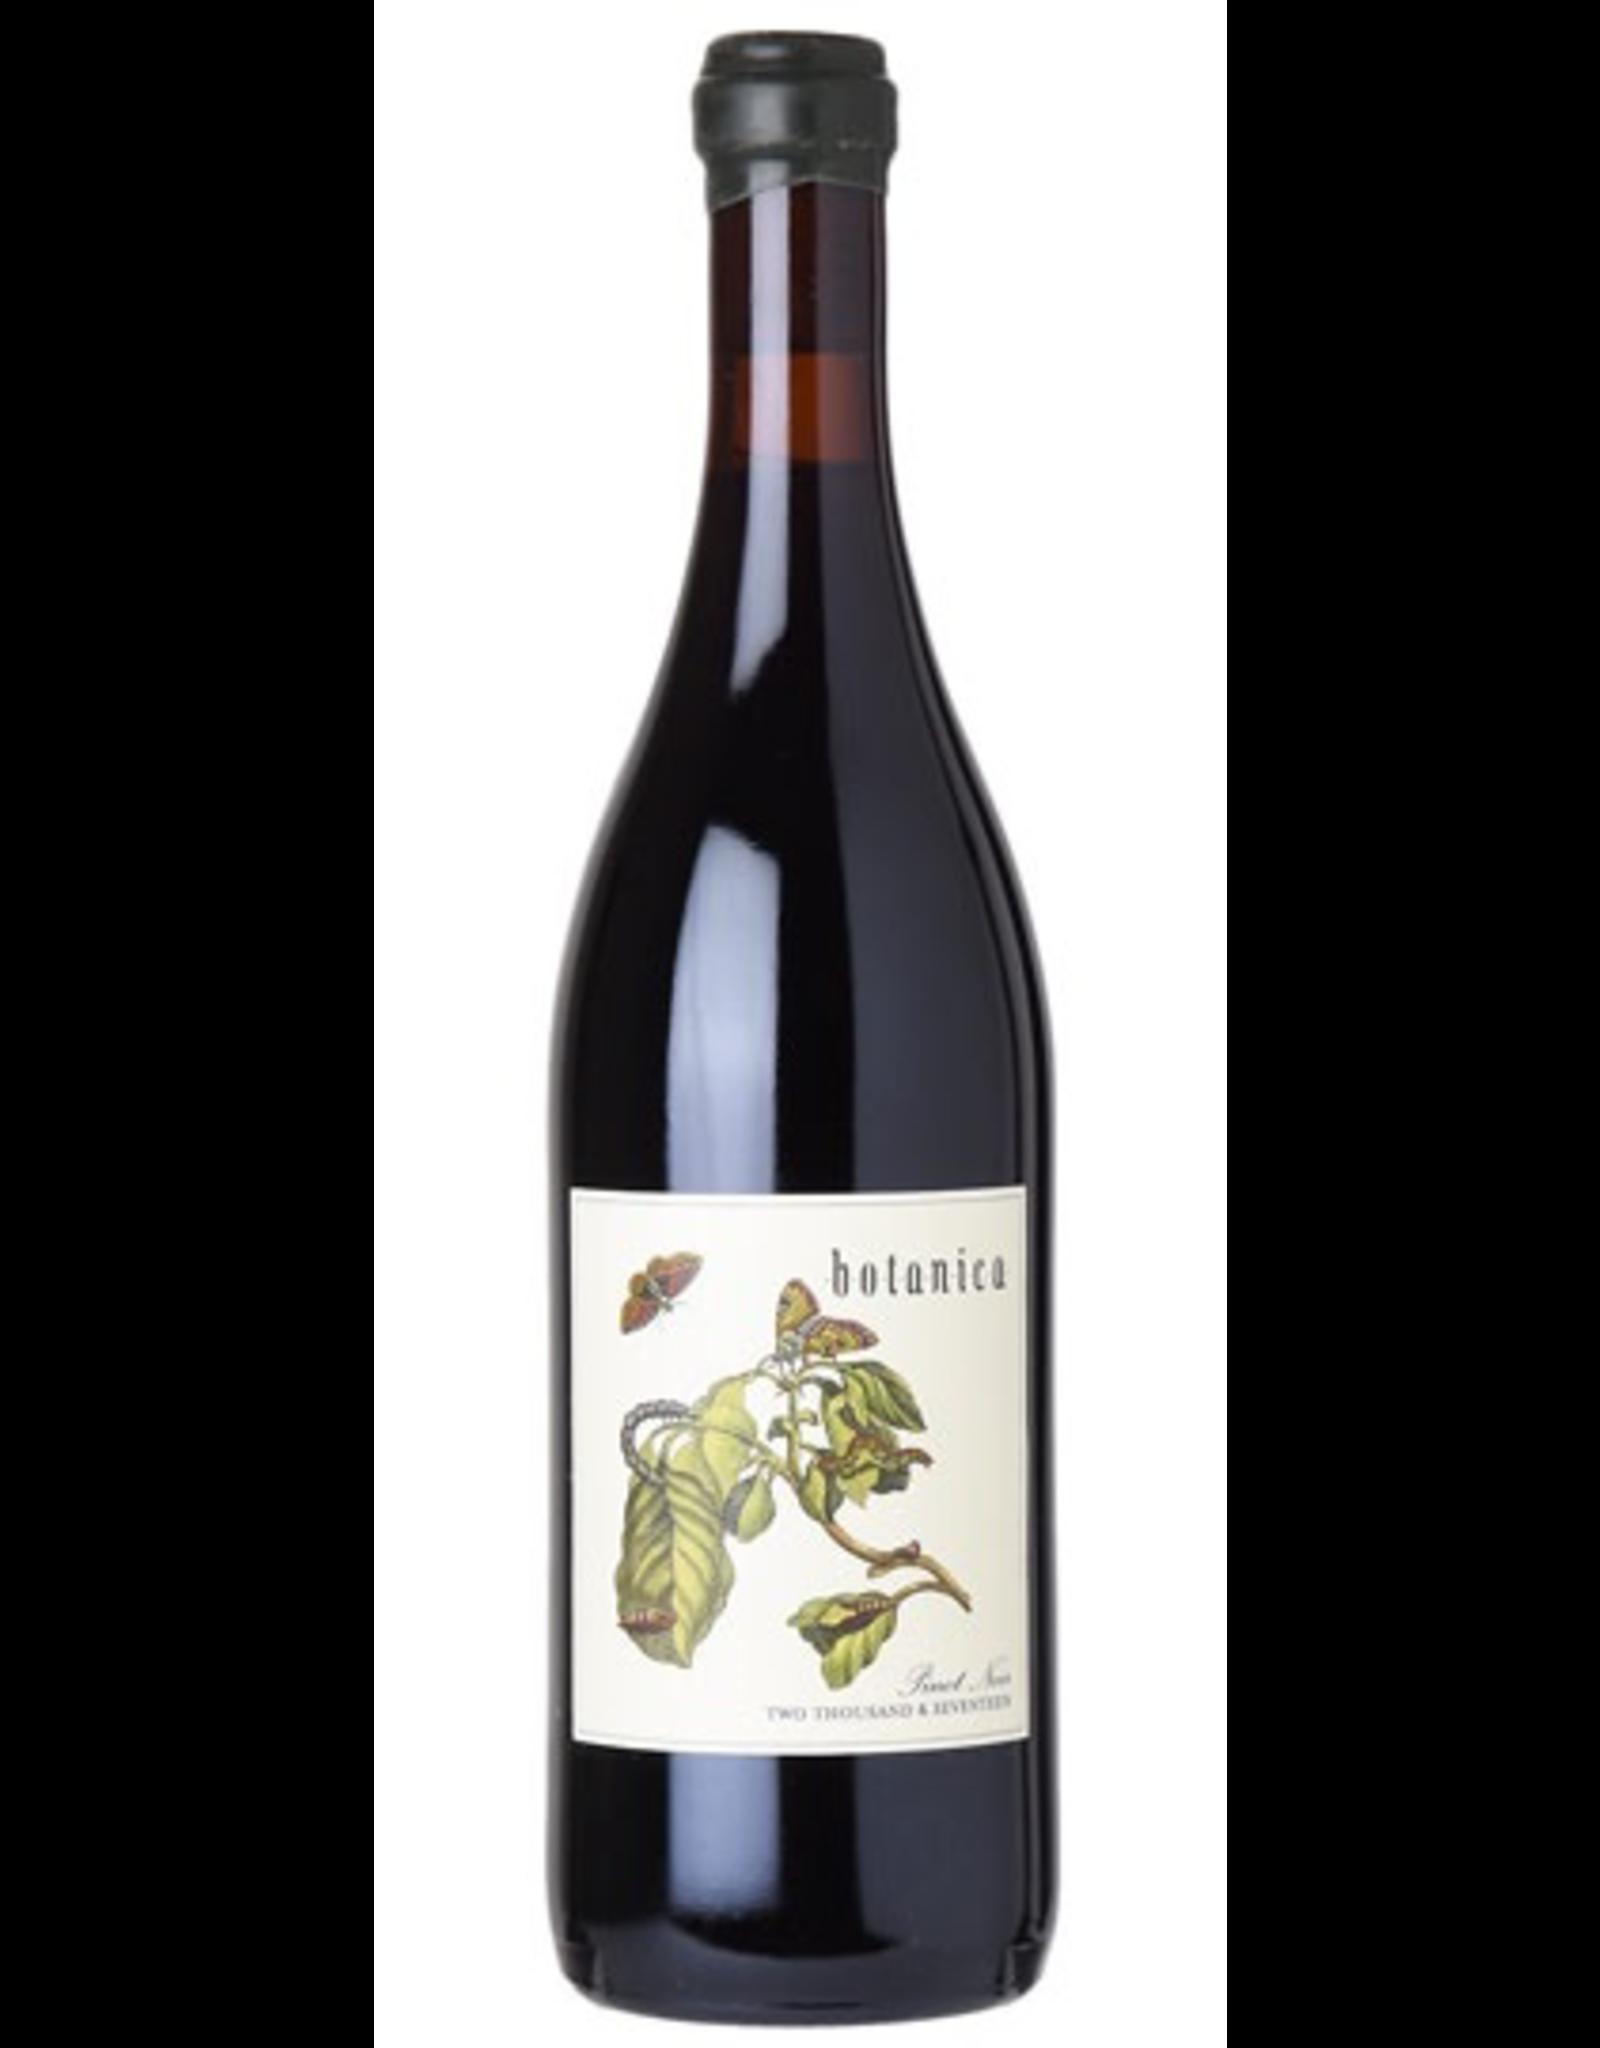 Red Wine 2017, Antica Terra Botanica, Pinot Noir, Eola-Amity Hills, Willamette Valley, Oregon, 14.0% Alc, CT93.6 JS97